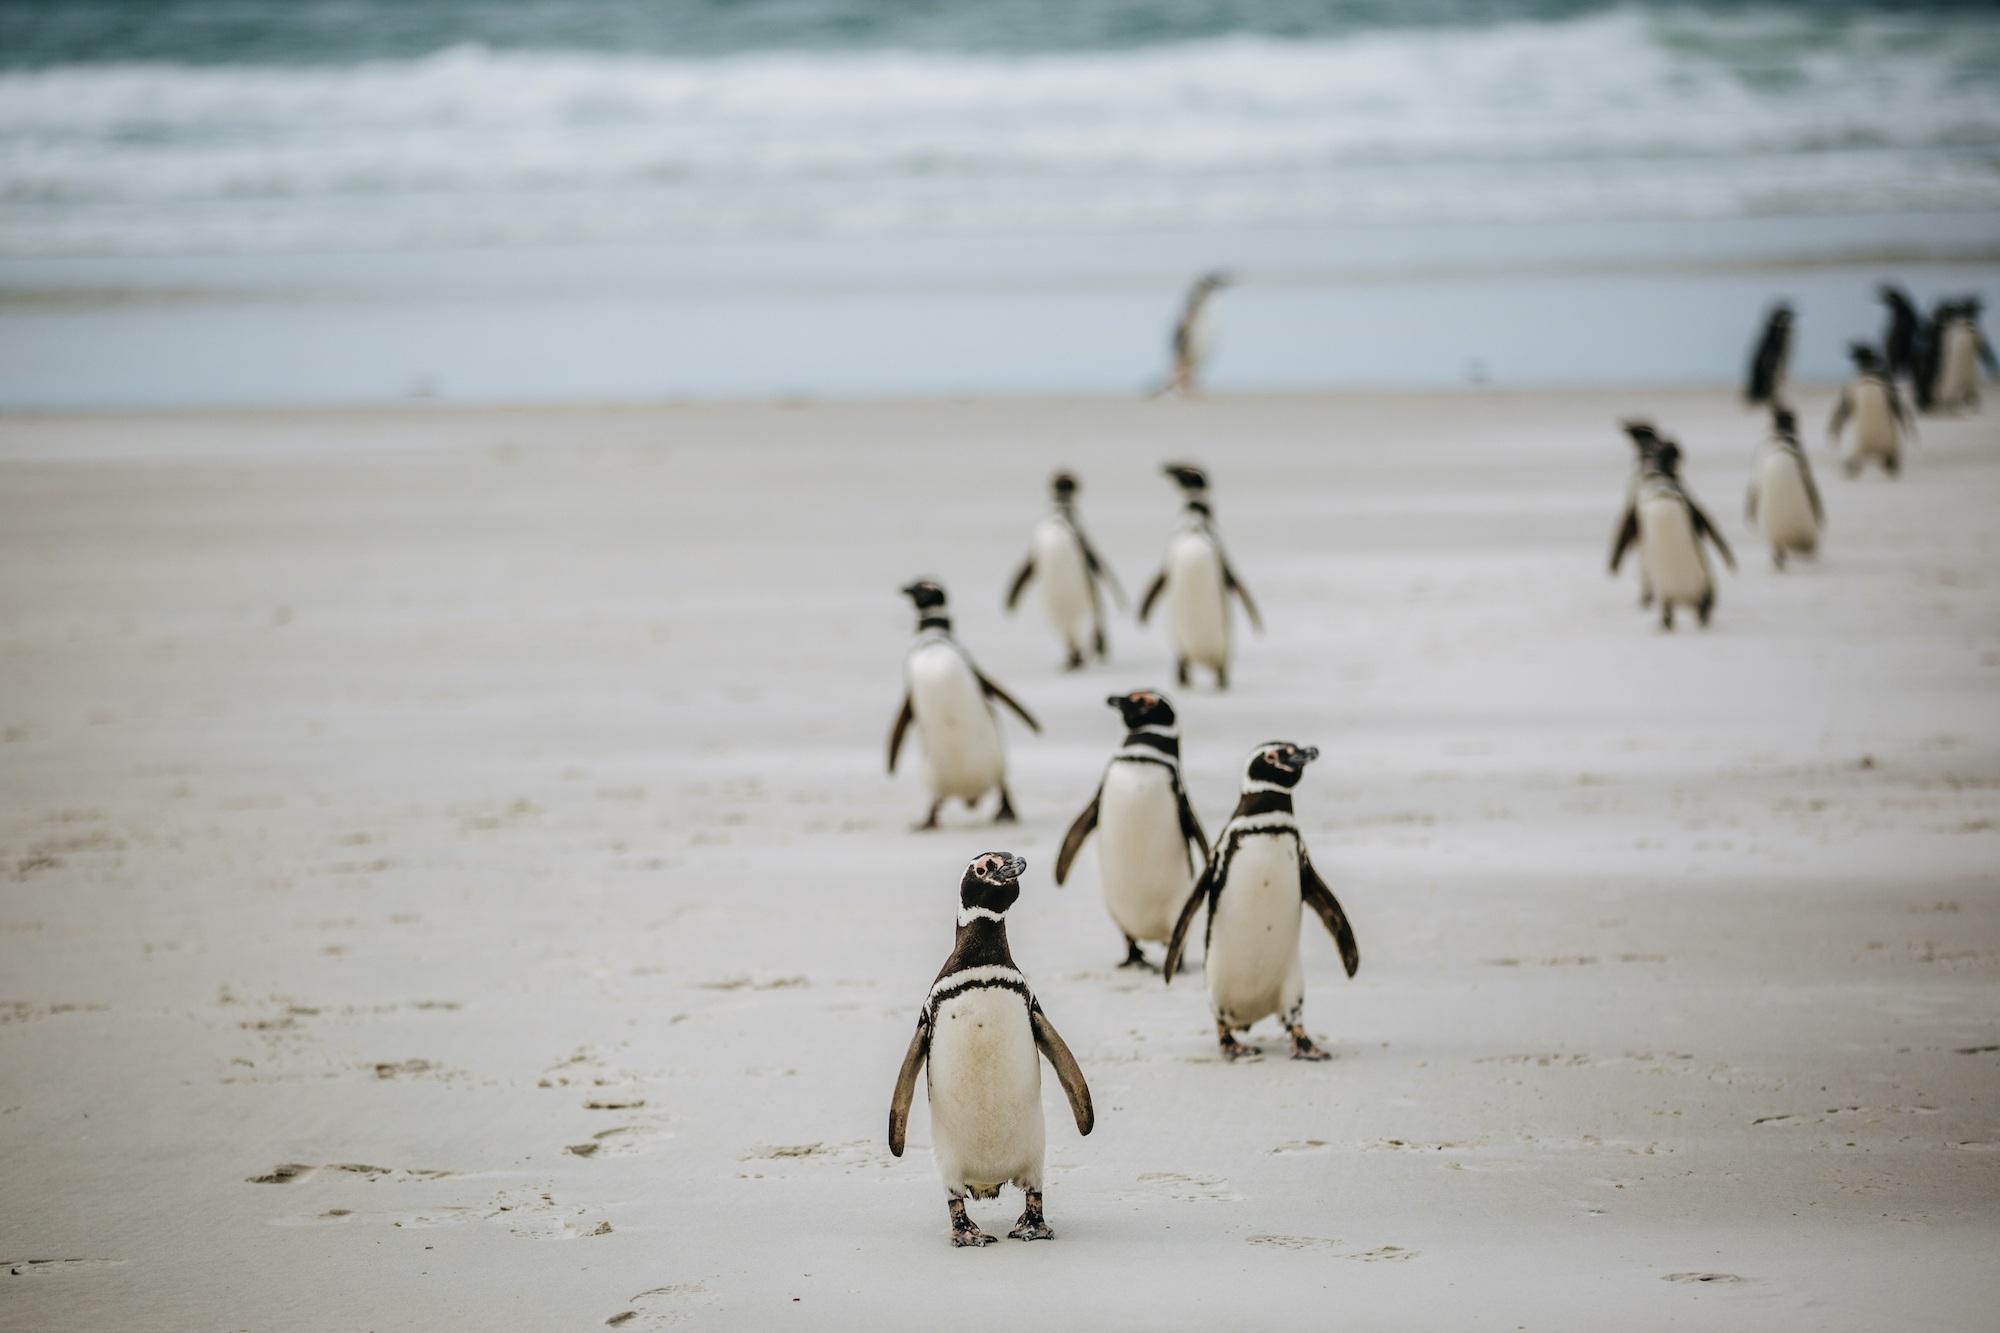 antarctic studies